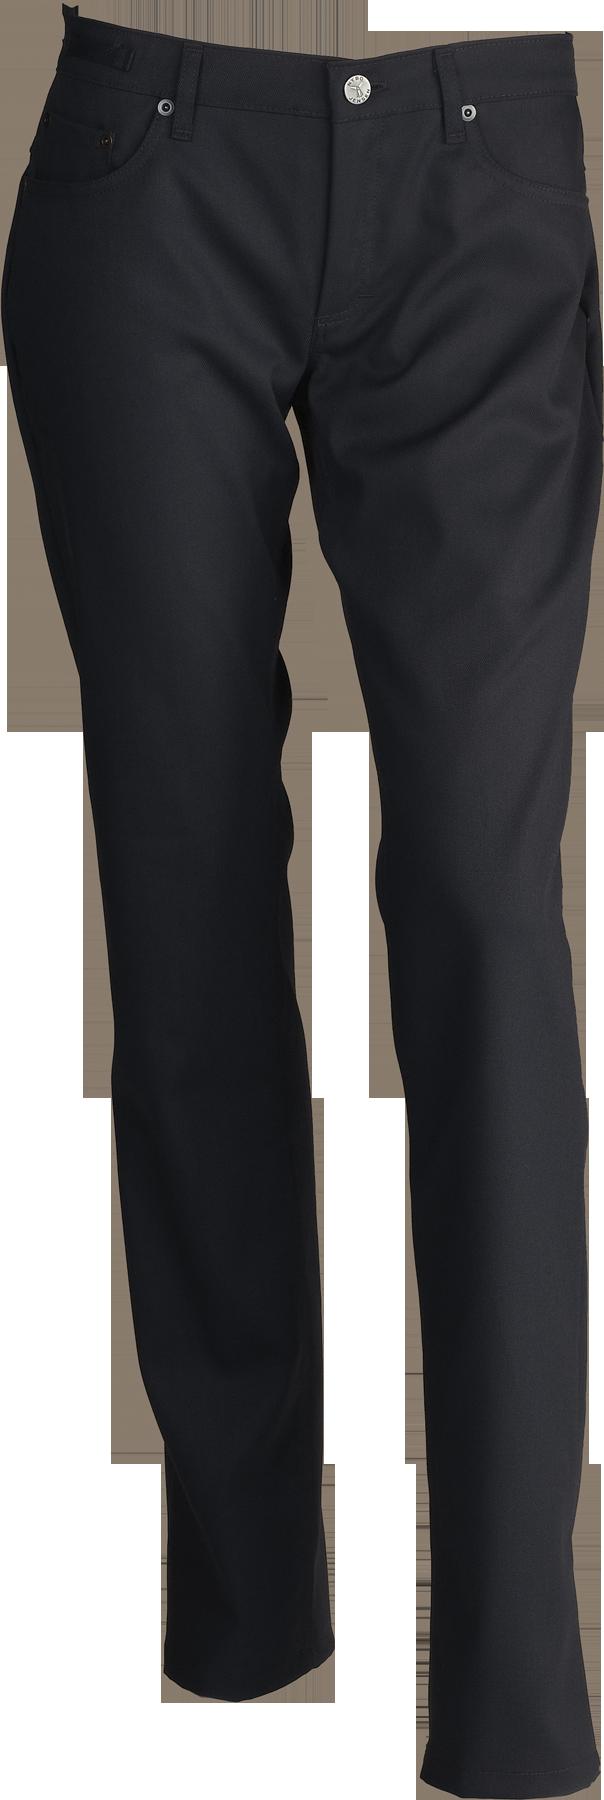 Jeans, Harmony, (105038100) - NOOS